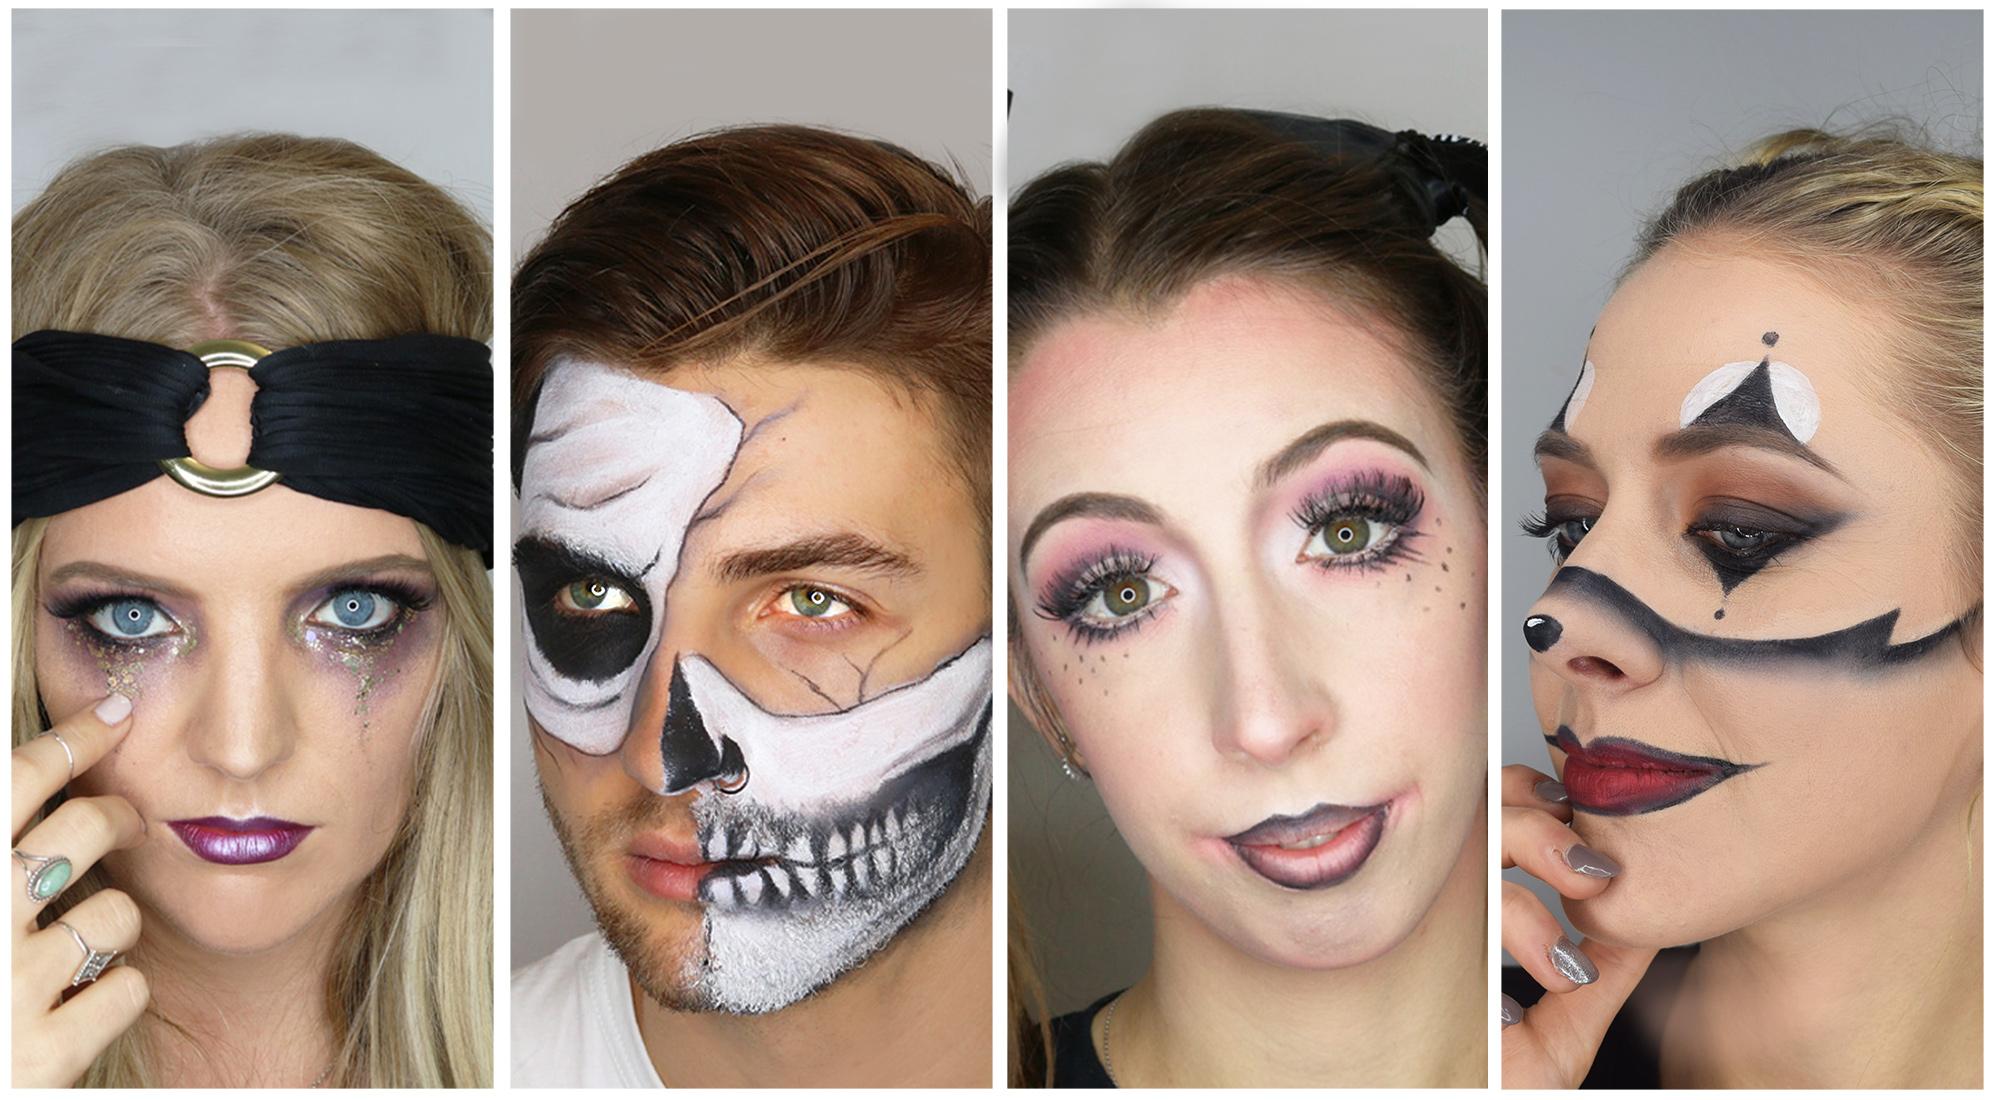 Halloween Makup 2019 Ideas Spook tacular Halloween makeup looks for 2018 | blow LTD